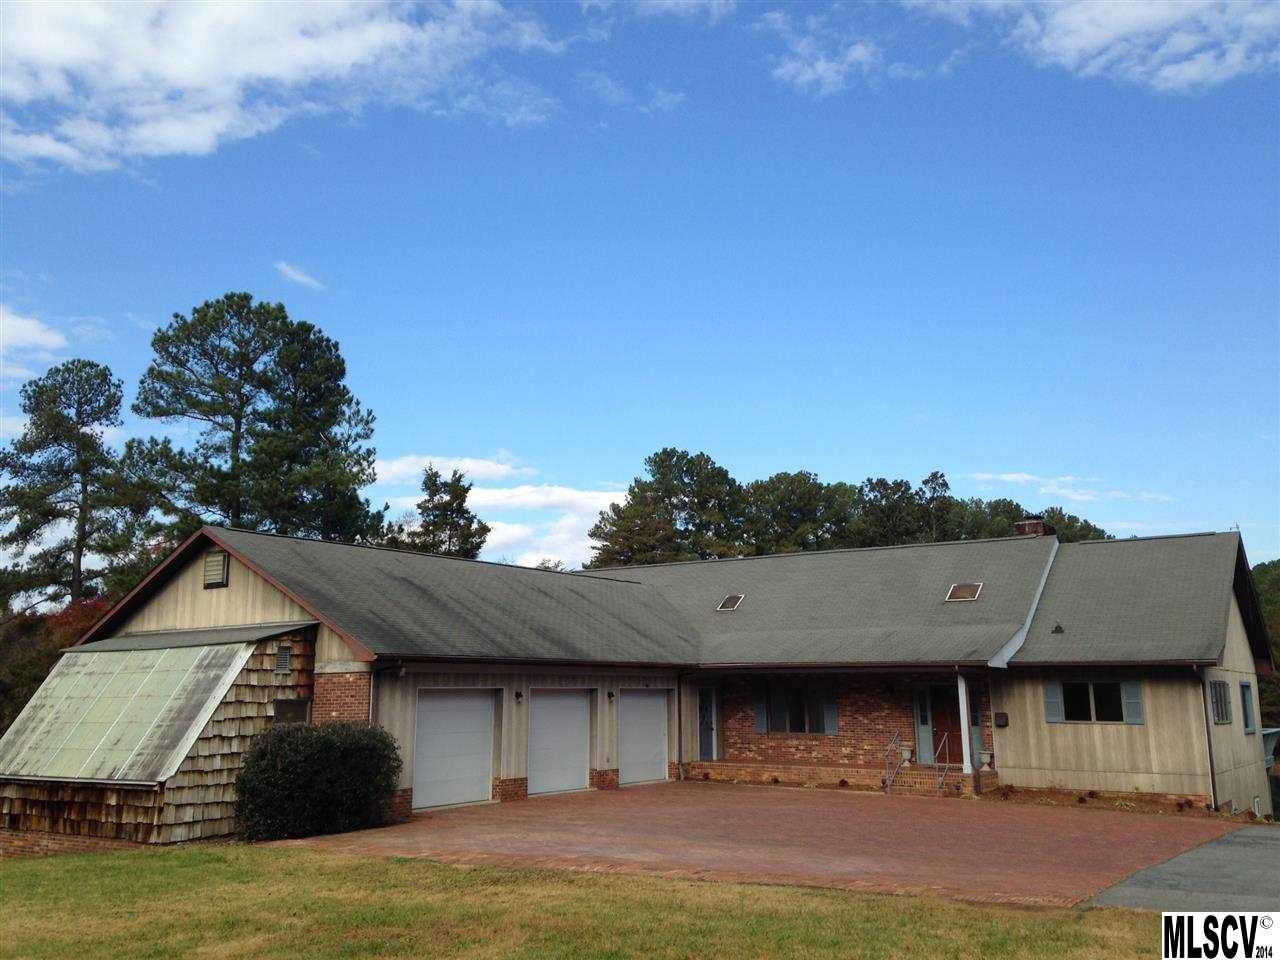 Real Estate for Sale, ListingId: 30647542, Claremont,NC28610